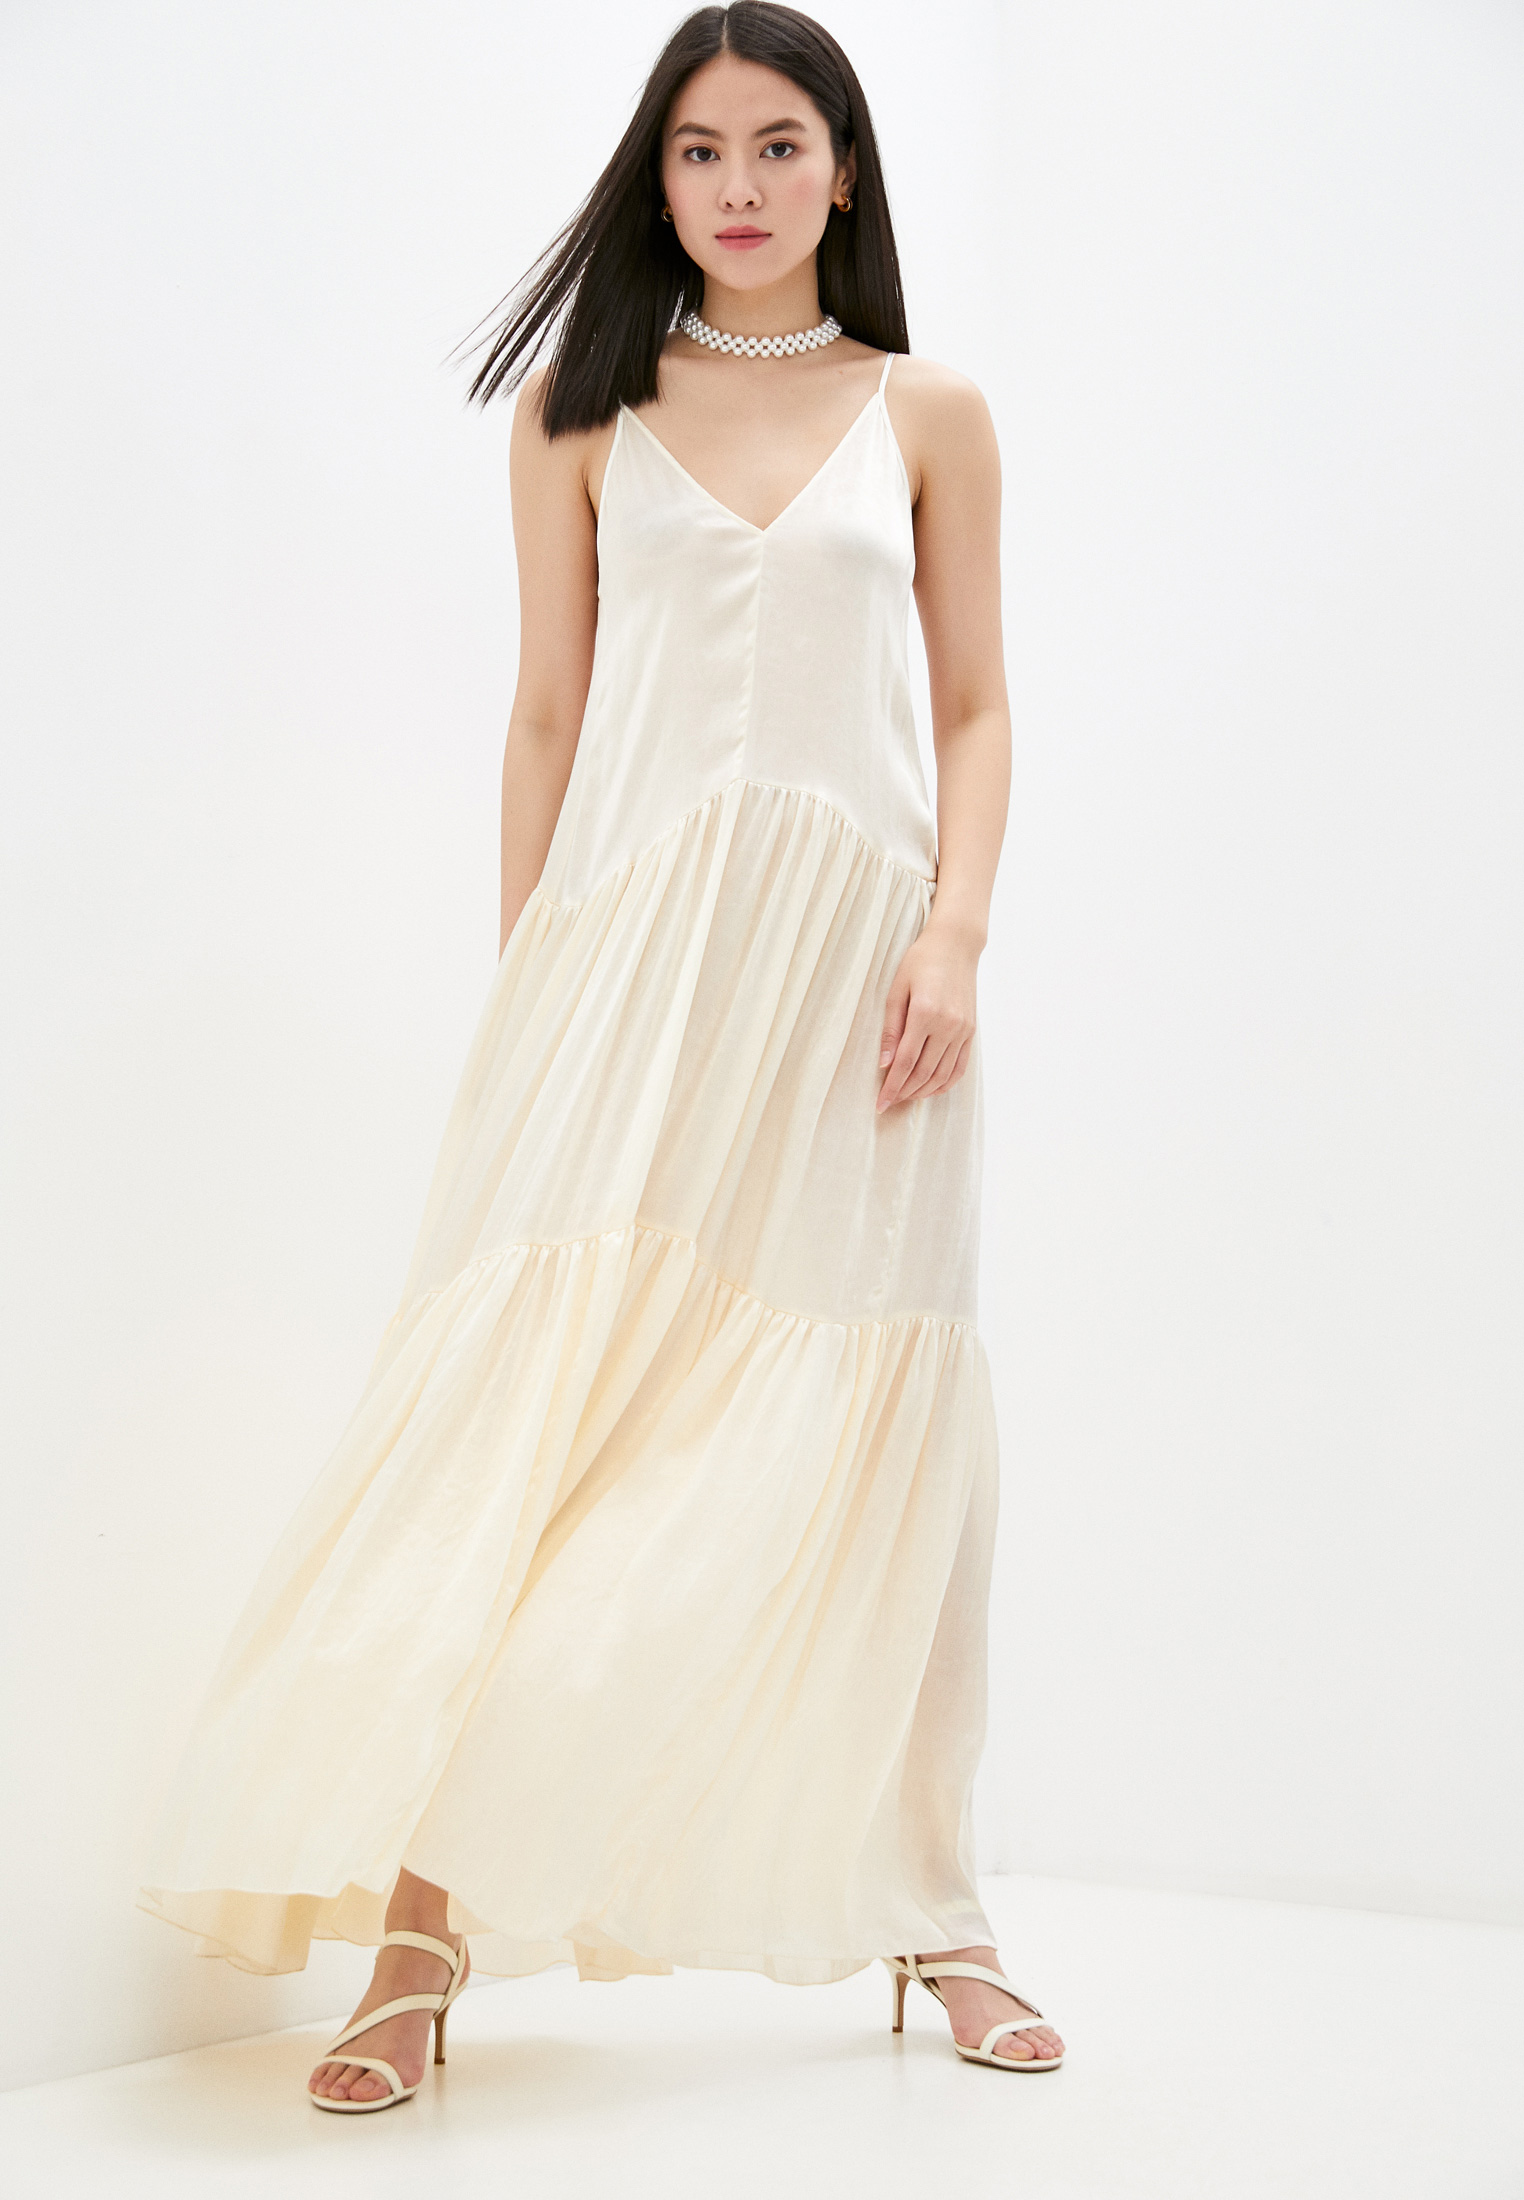 Женские платья-сарафаны Forte Forte 7254MYDRESS